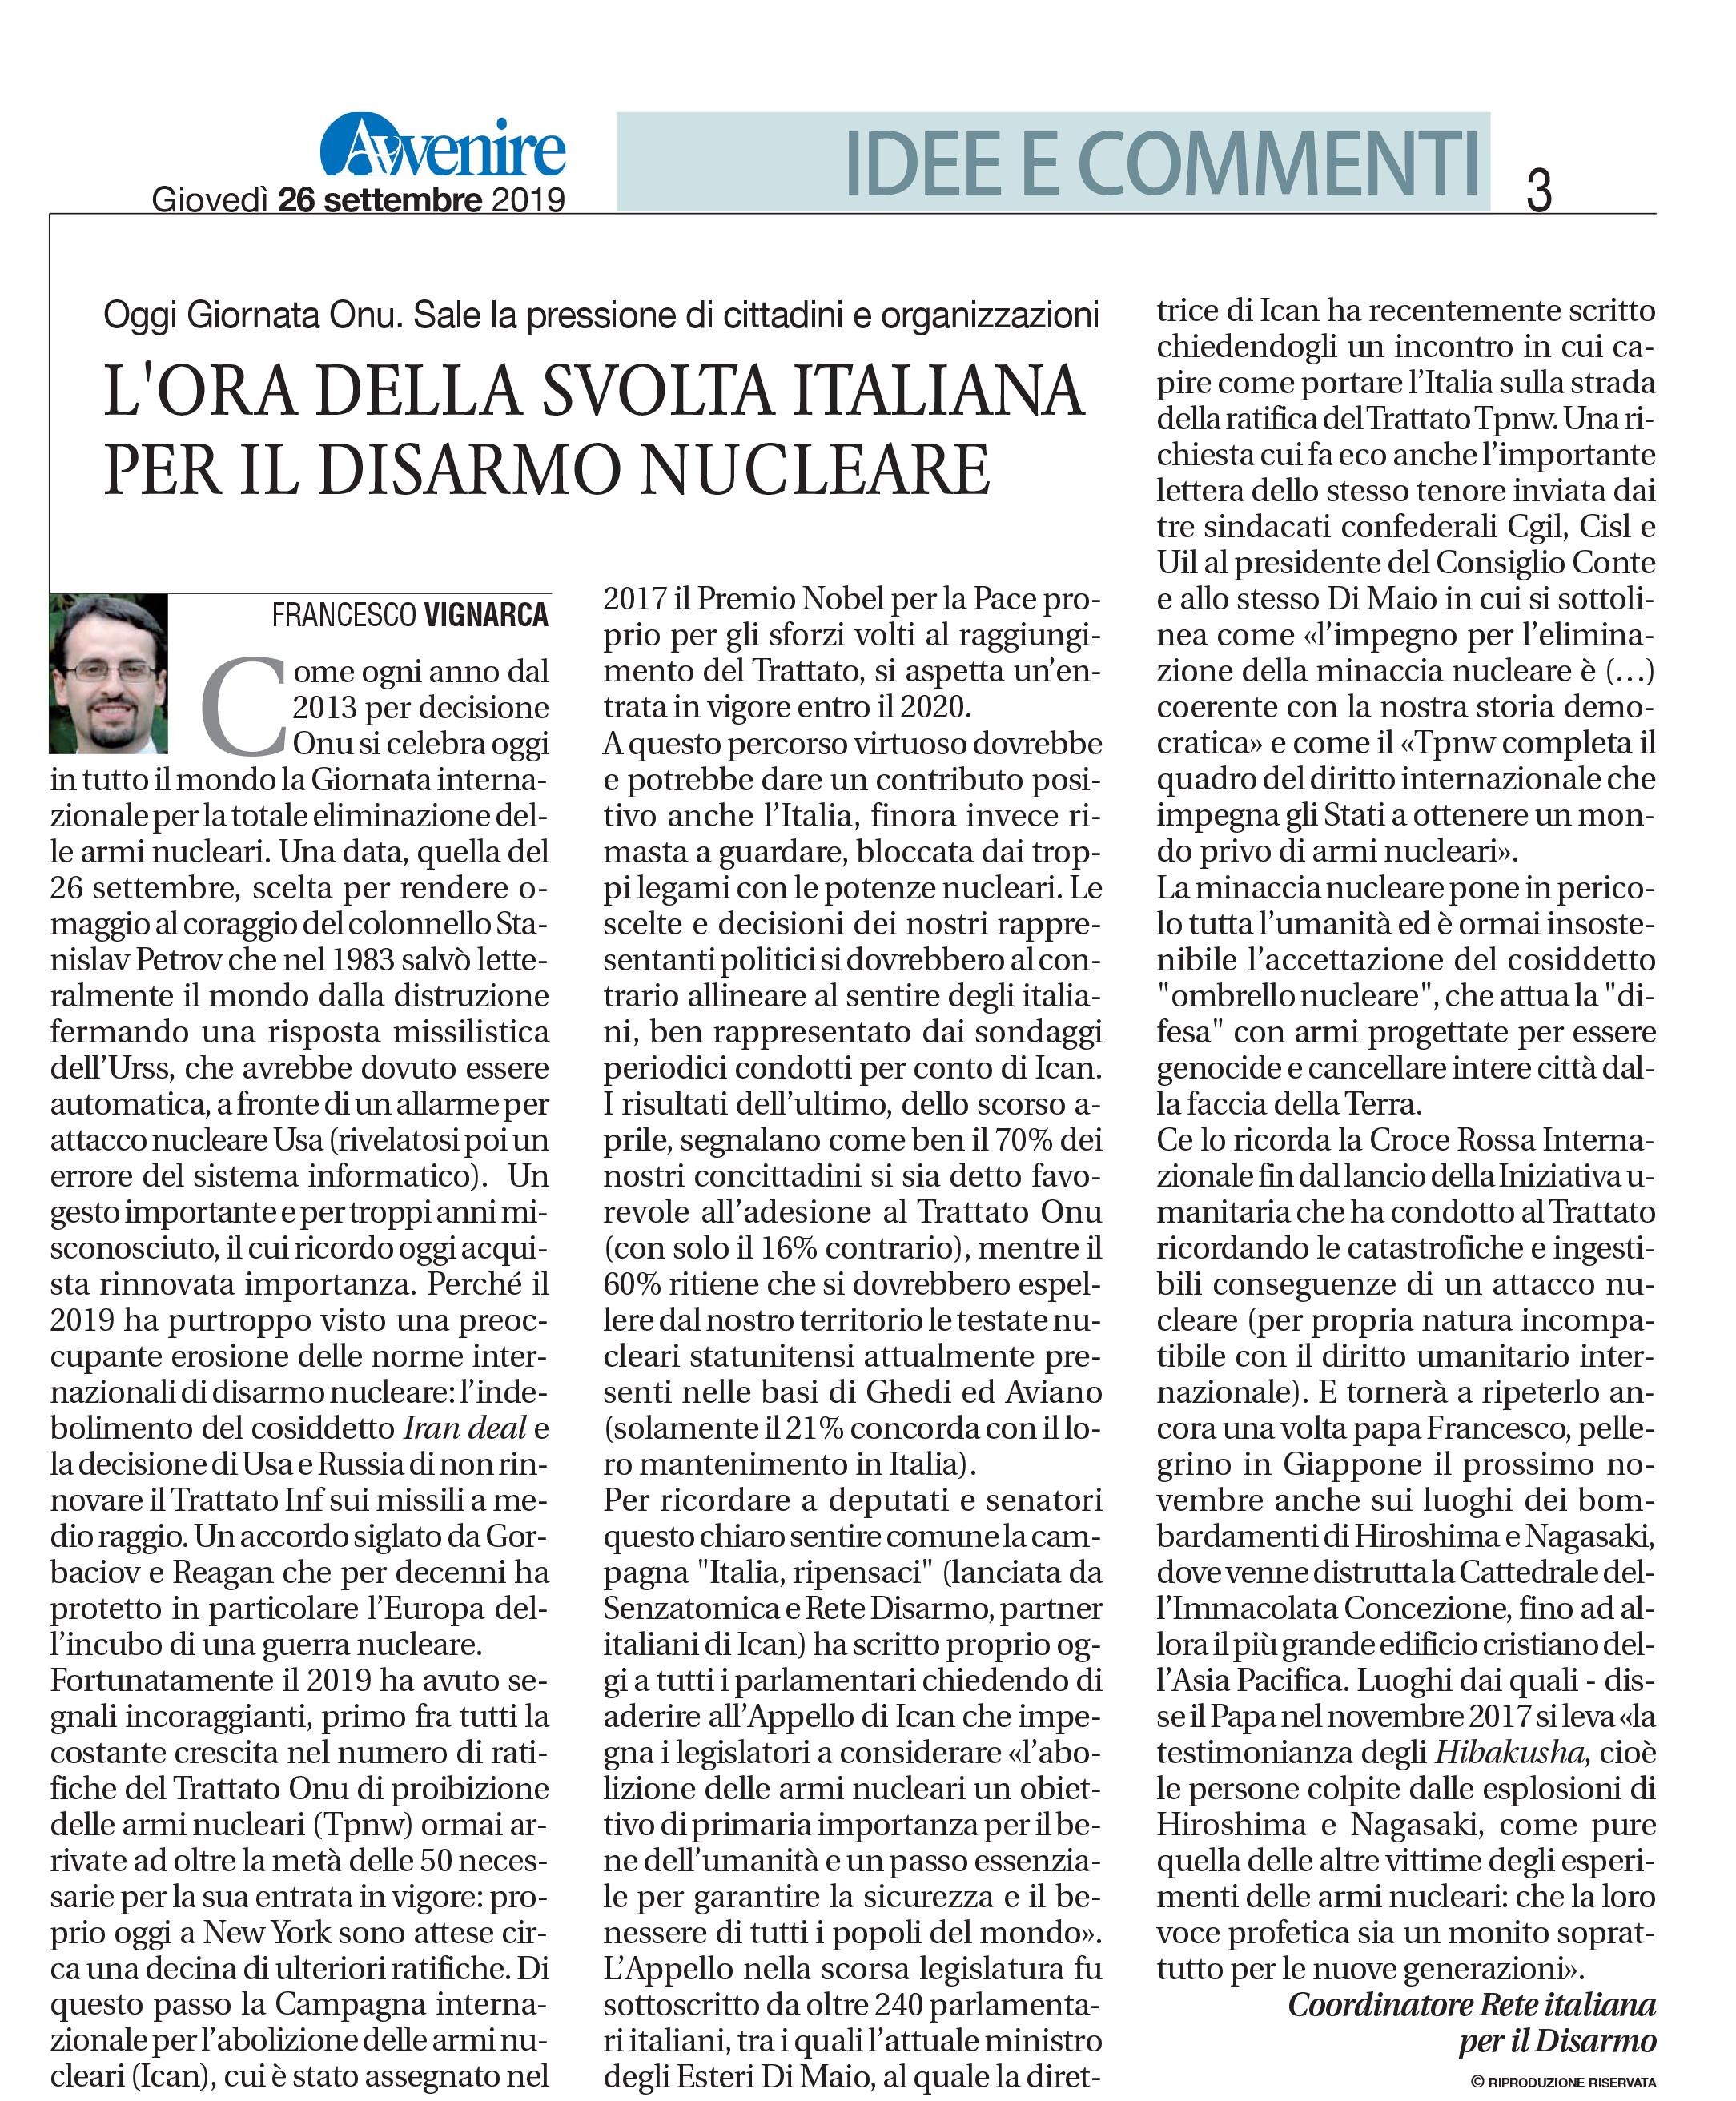 Avvenire_editoriale_GiornataDisarmoNucleare